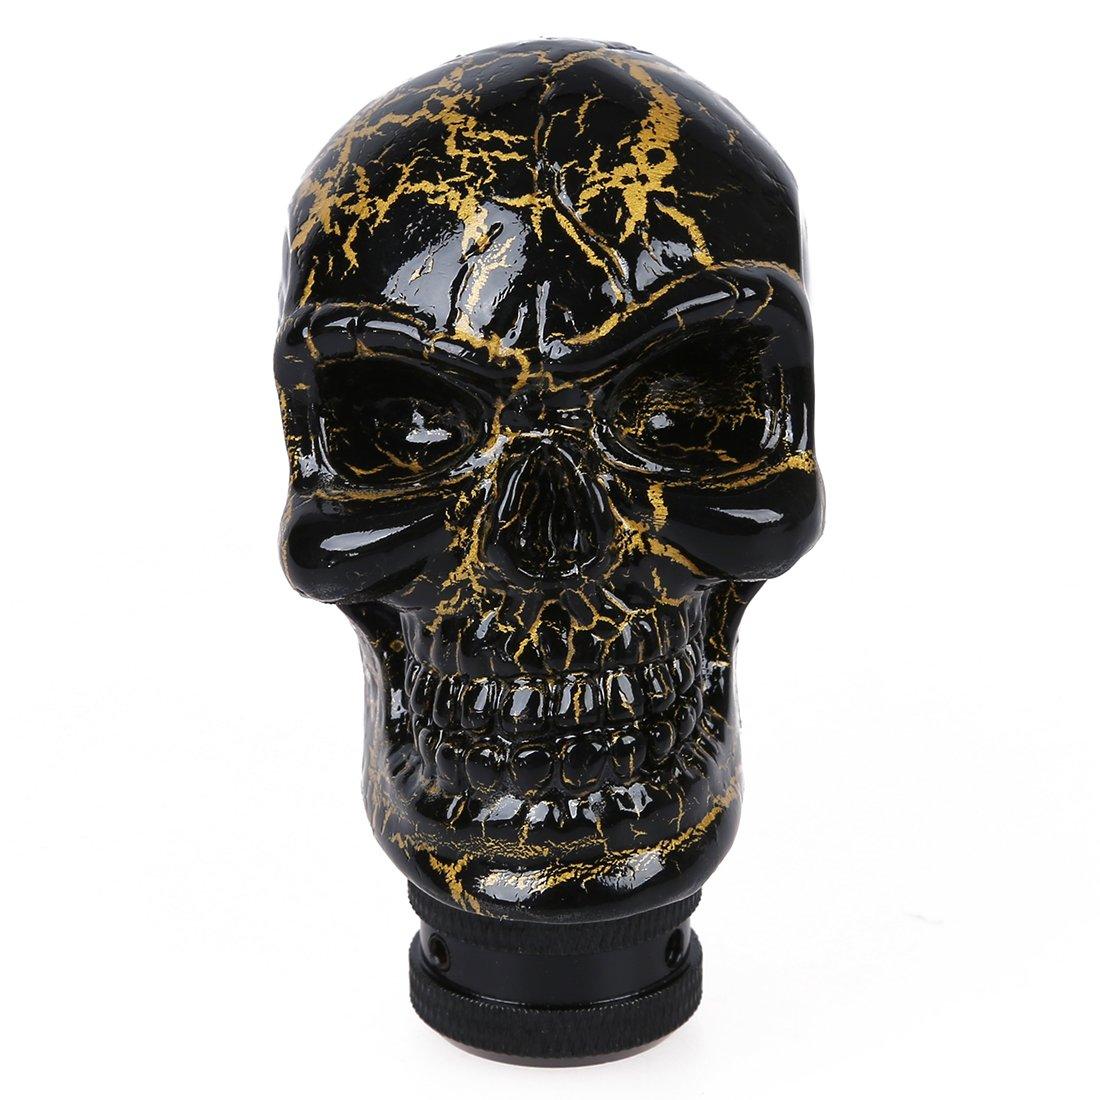 SODIAL(R) Auto Car Black Gold Tone Skull Head Style Ceramic Gear Shift Knob 008955